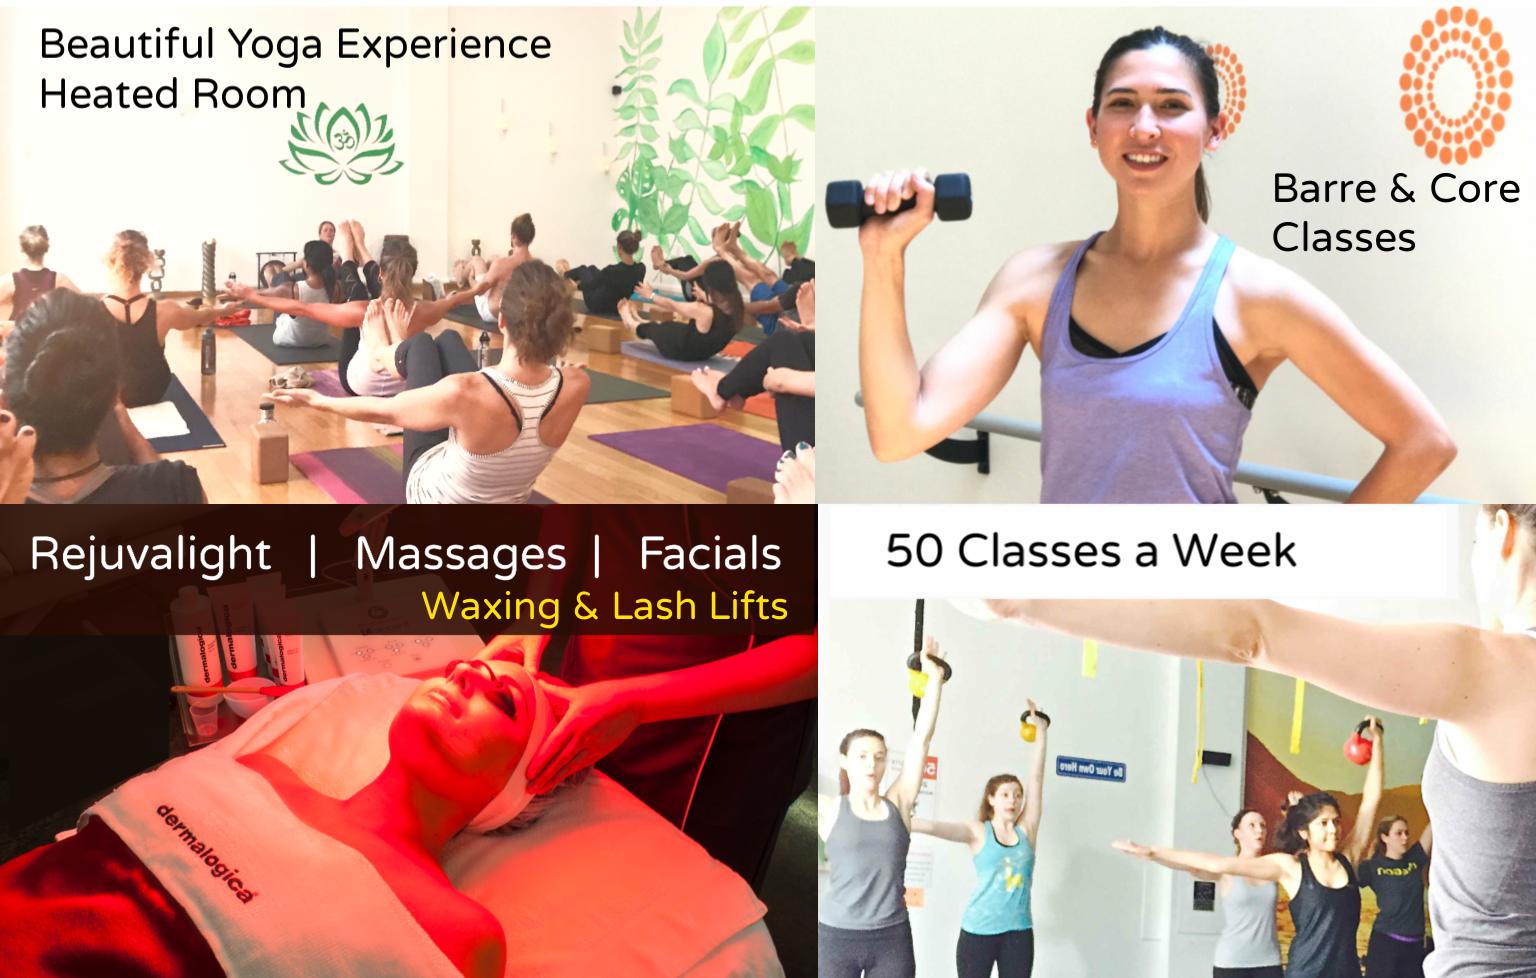 San Francisco Yoga | Glow Yoga & Wellness